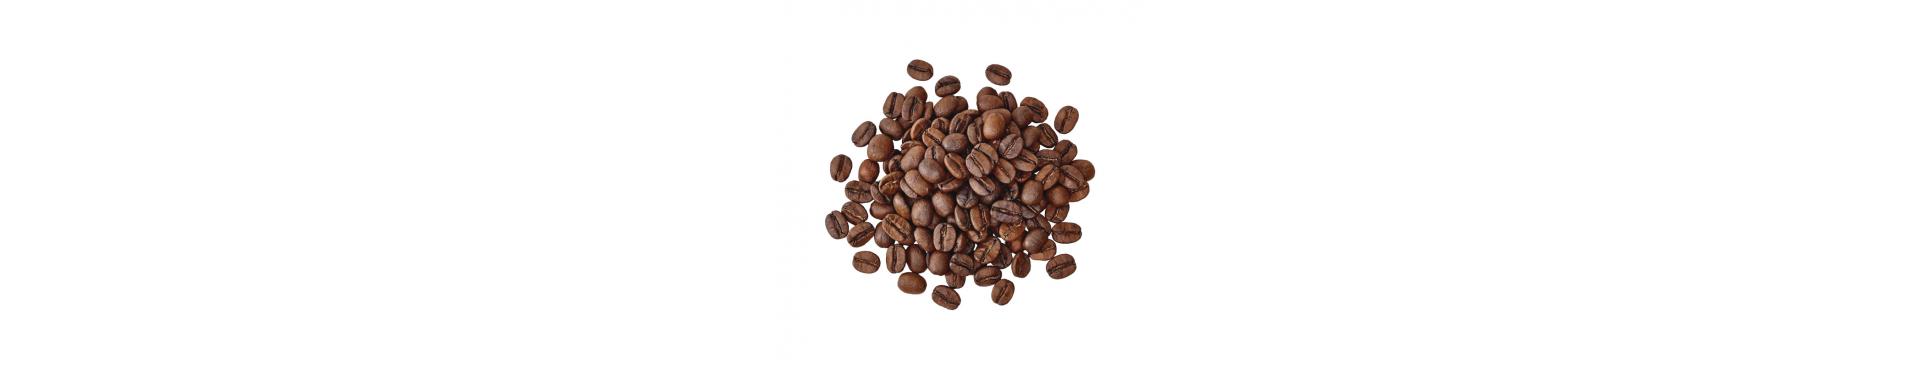 Caffè in grani, macinato e solubile